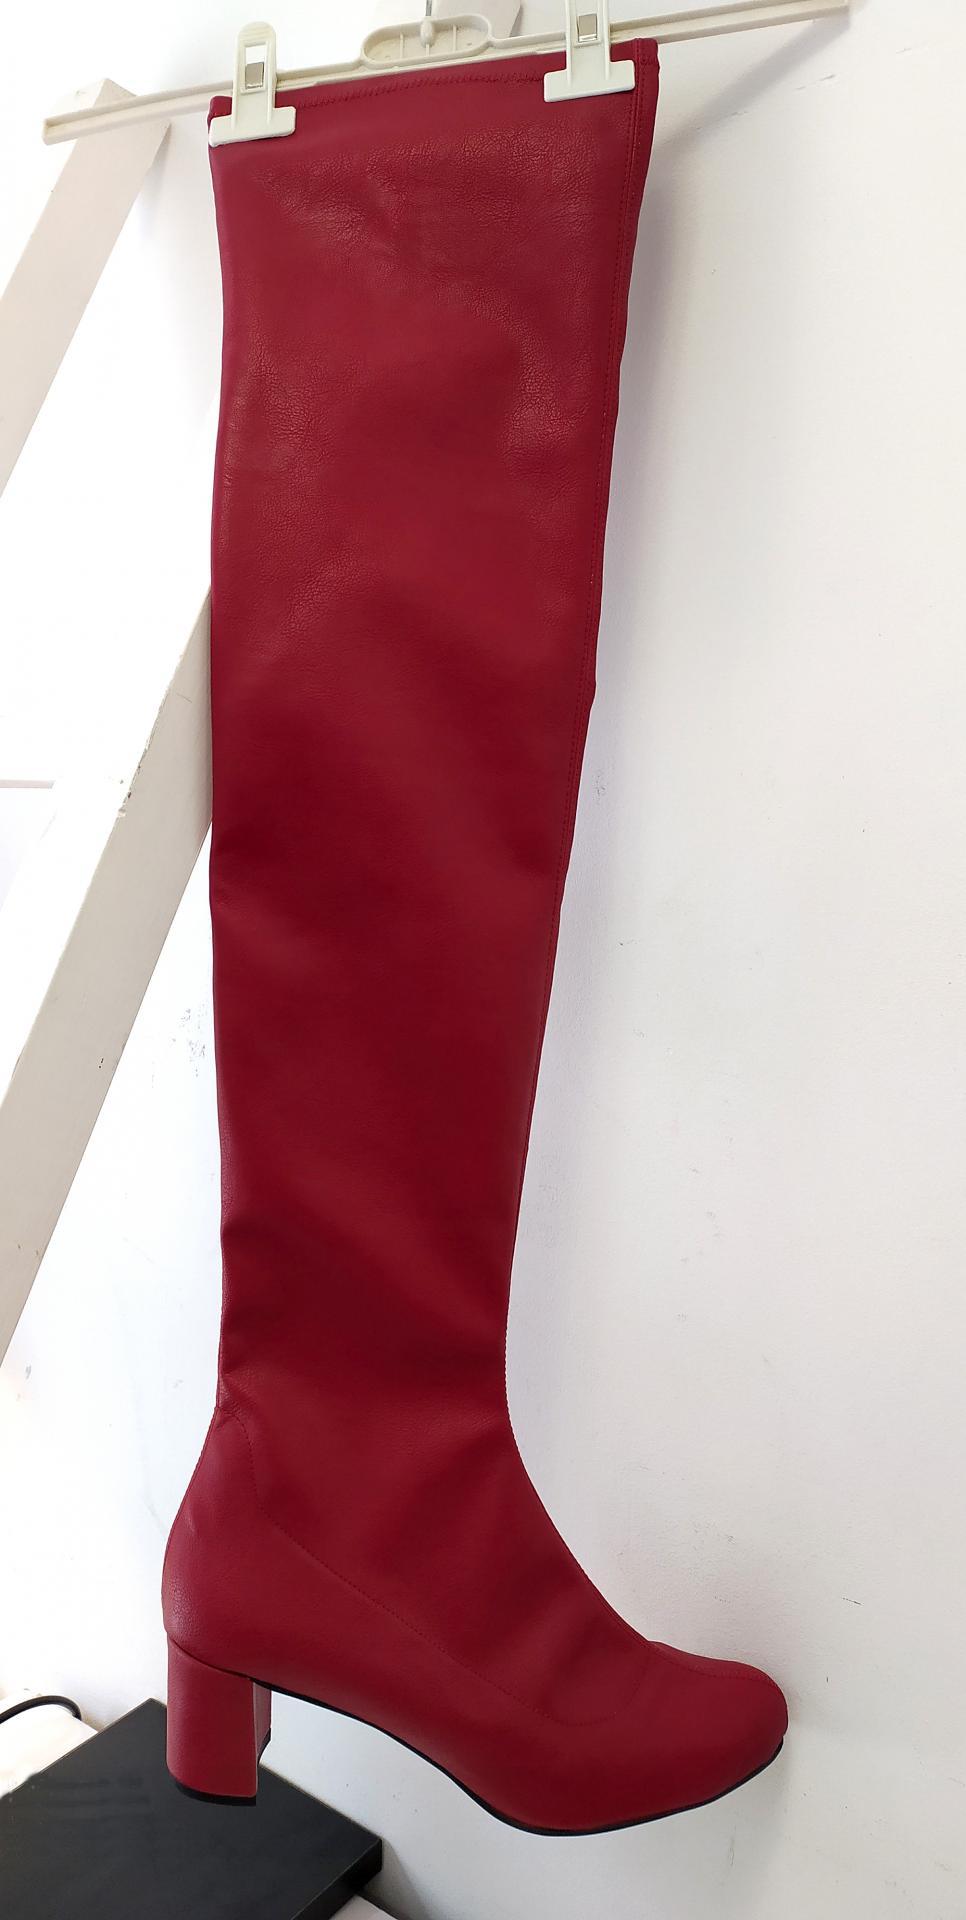 Bota mosquetera personalizada